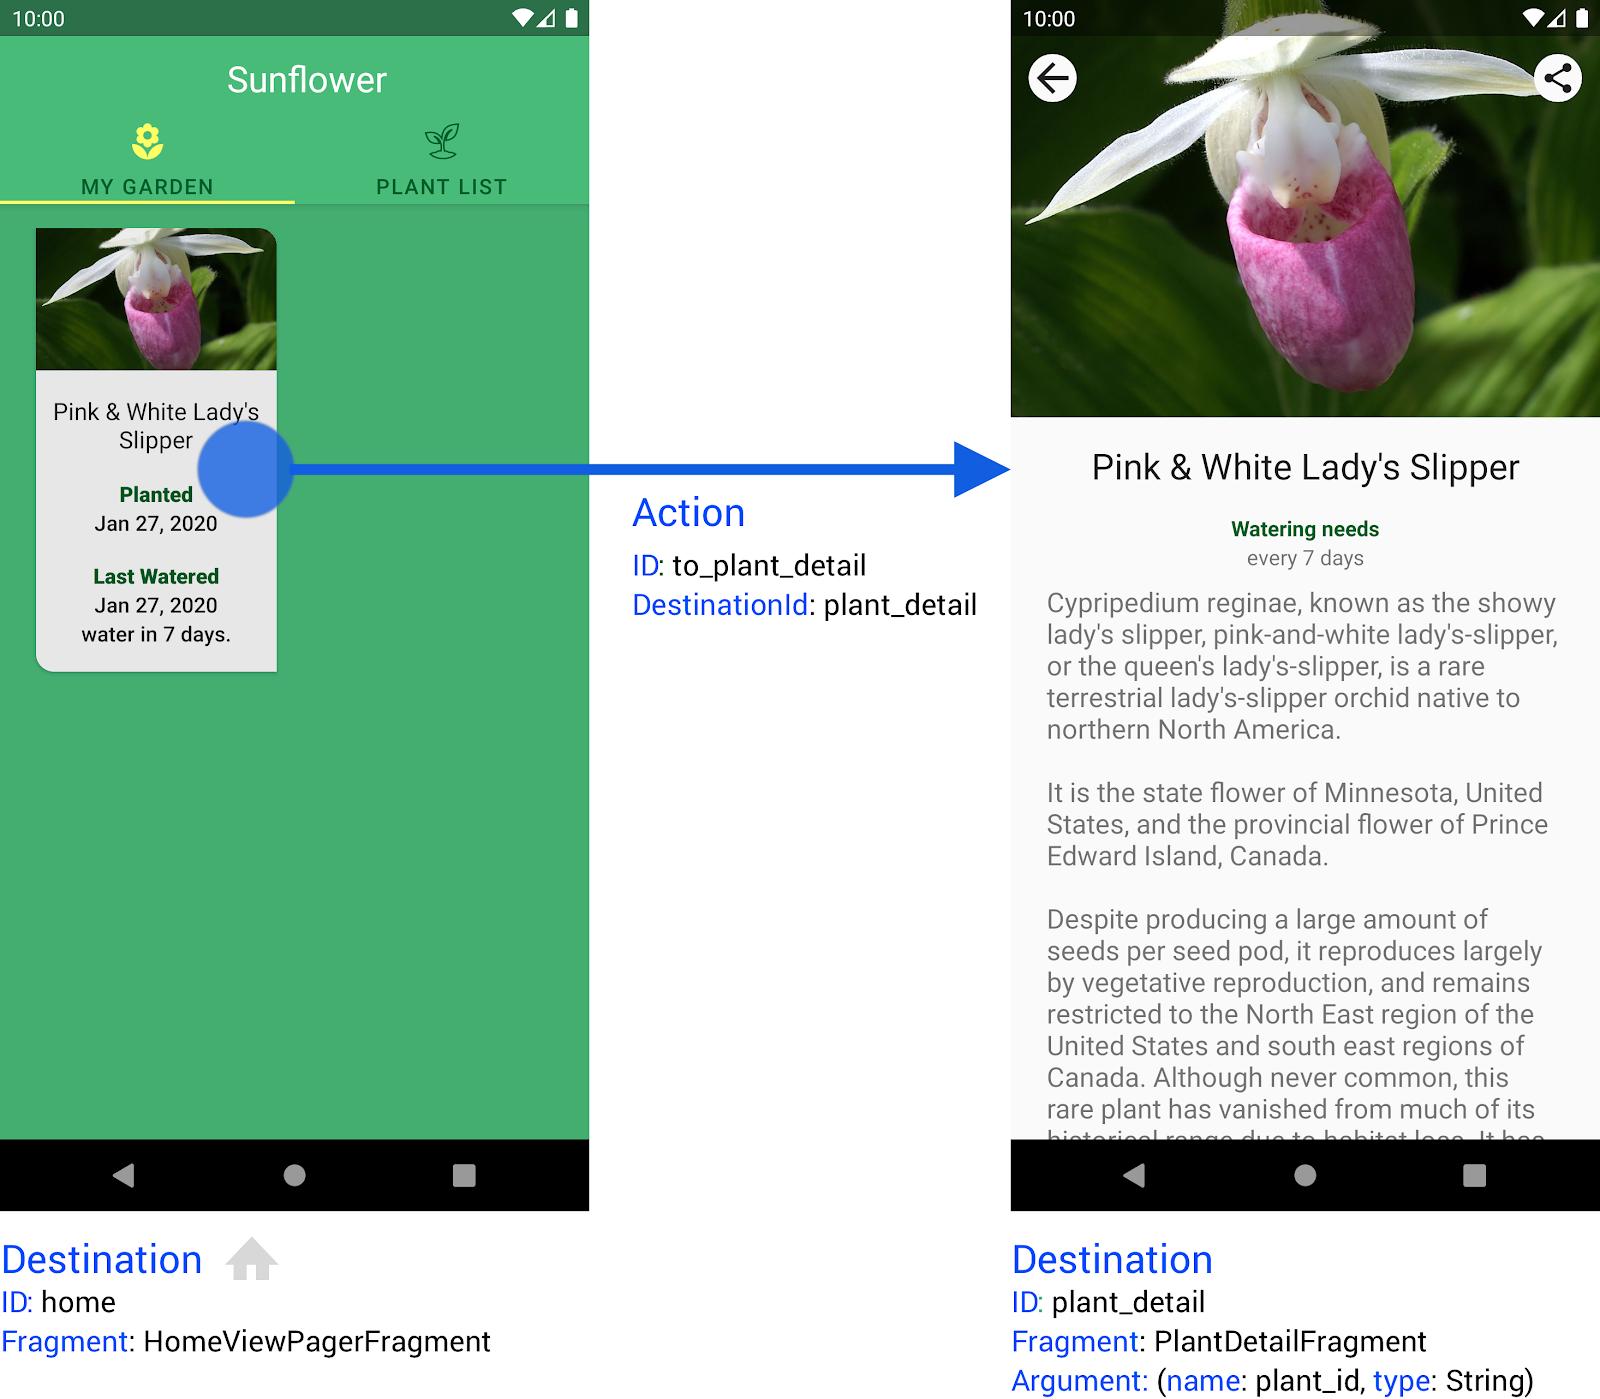 Sunflower アプリの 2 つのデスティネーションと、それらを接続するアクション。